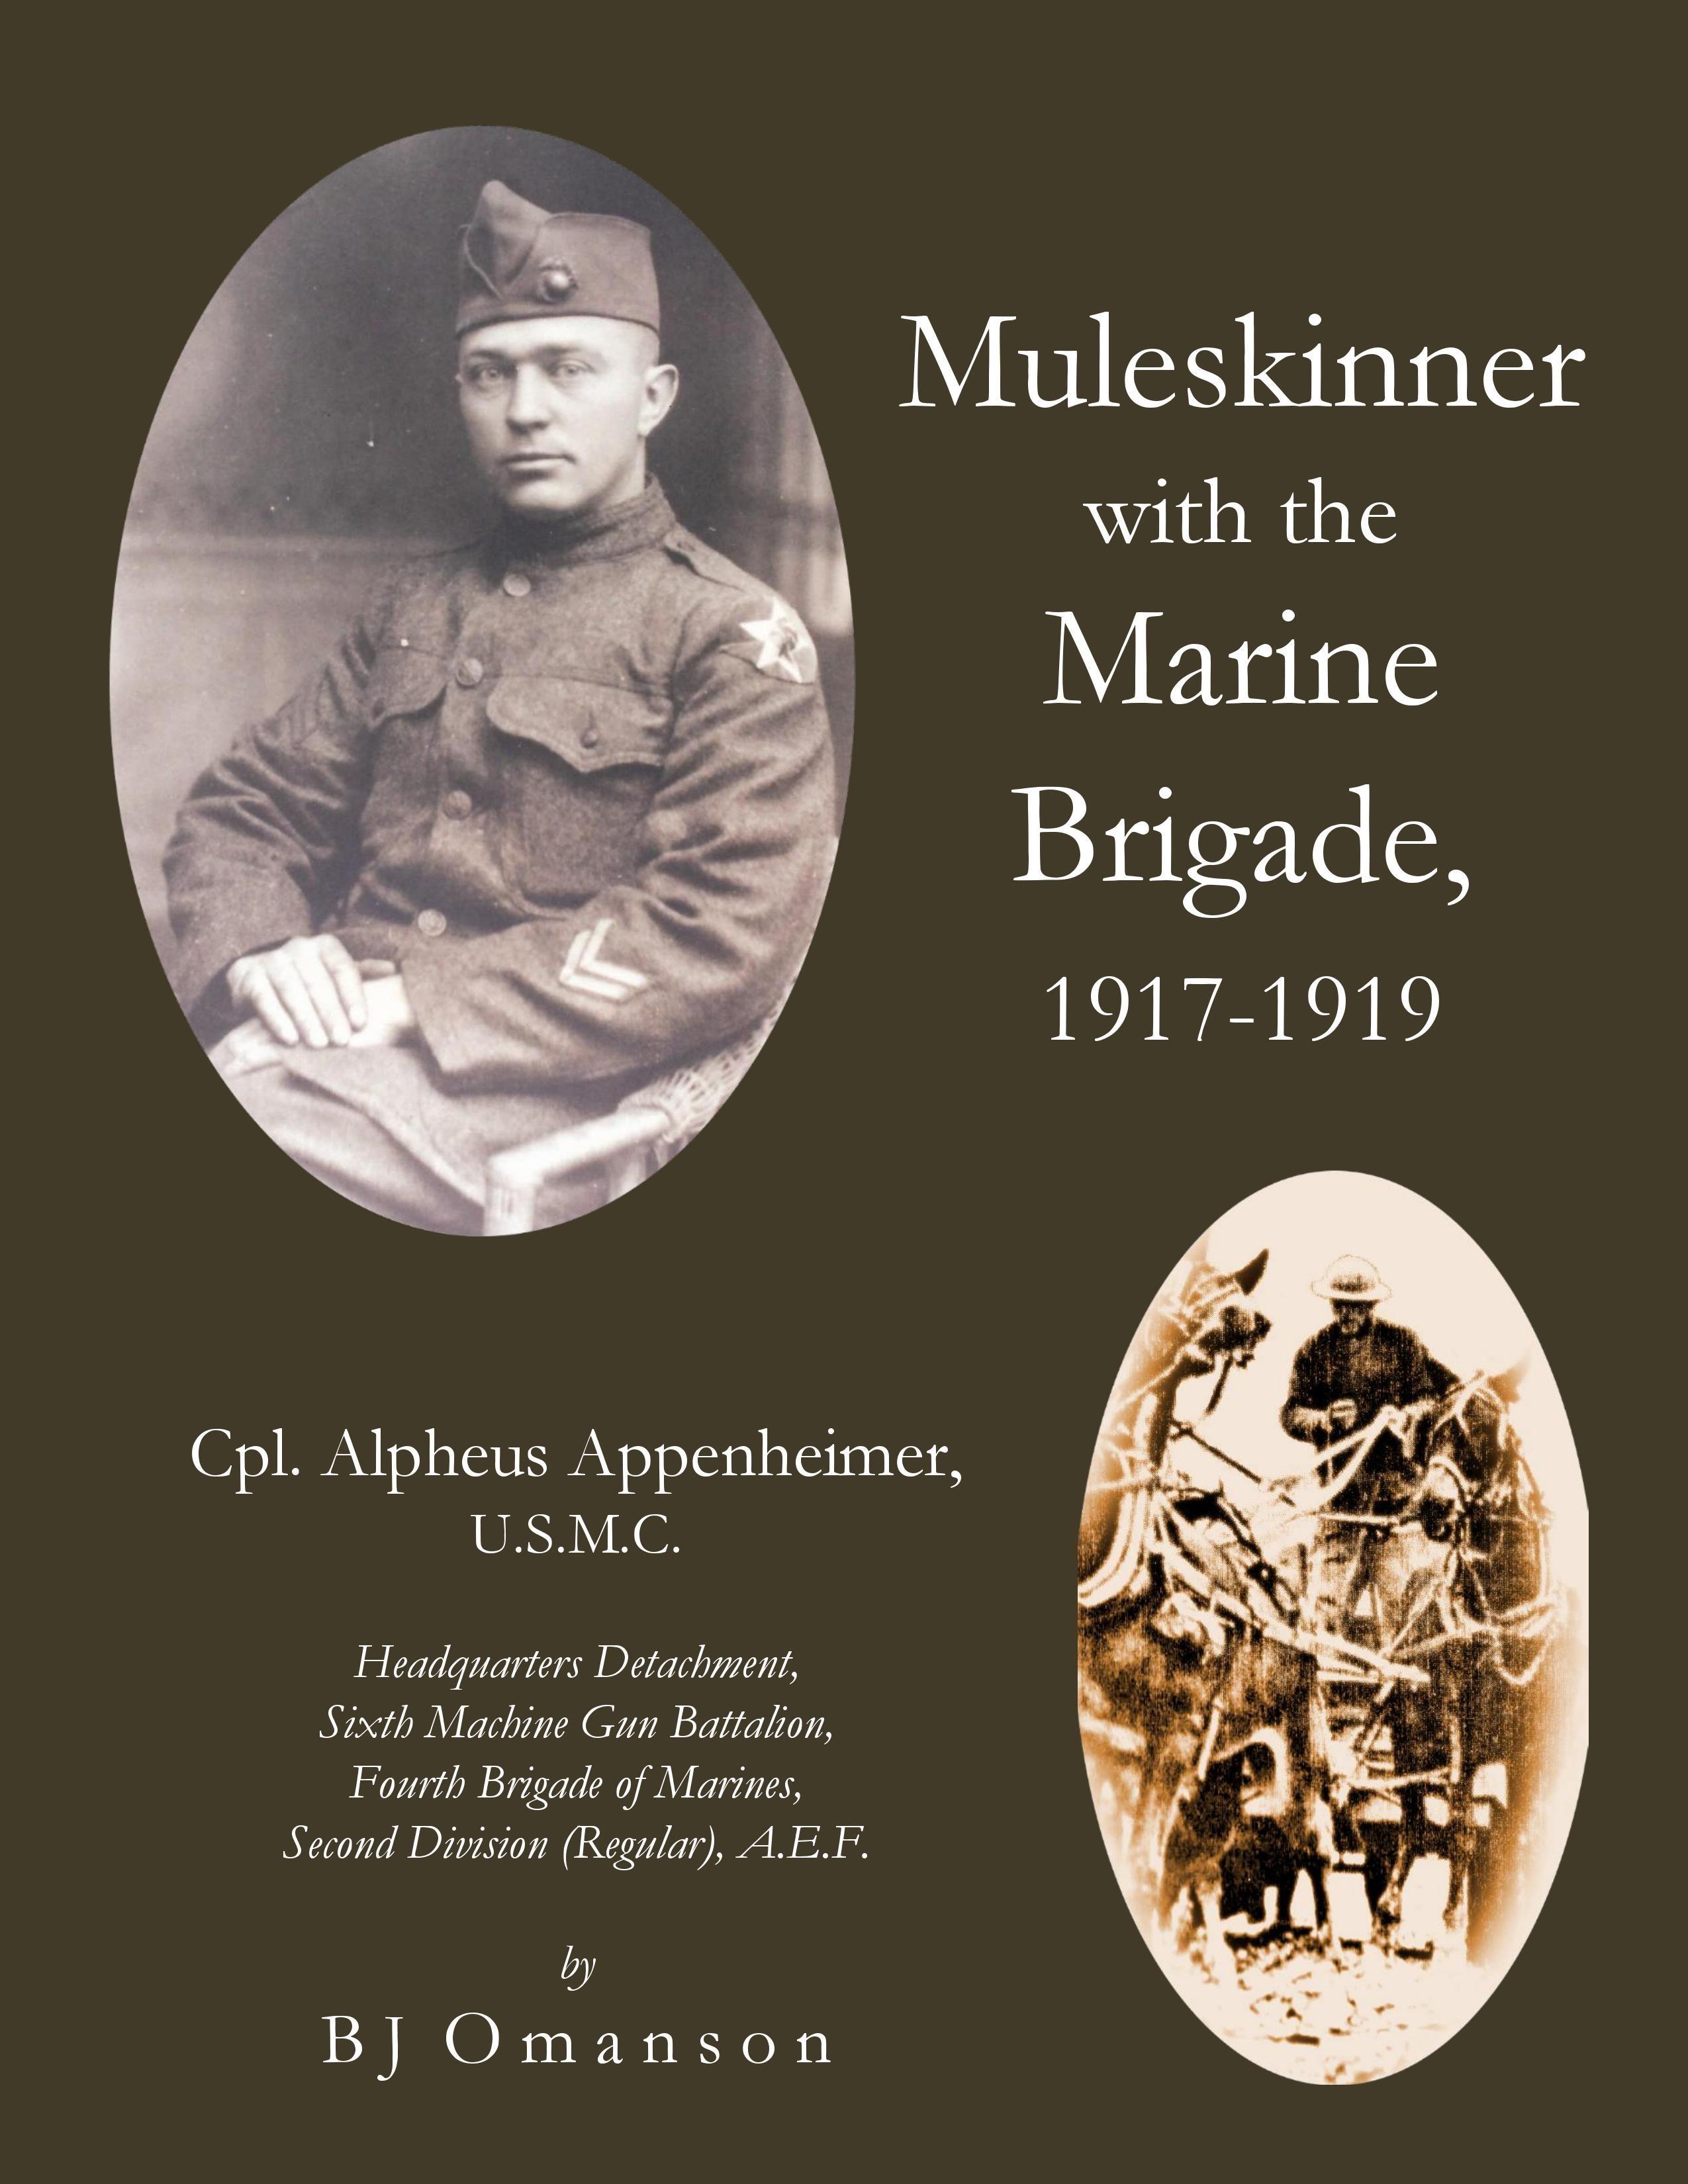 Muleskinner with the Marine Brigade: Cpl Alpheus Appenheimer, 1917-1919